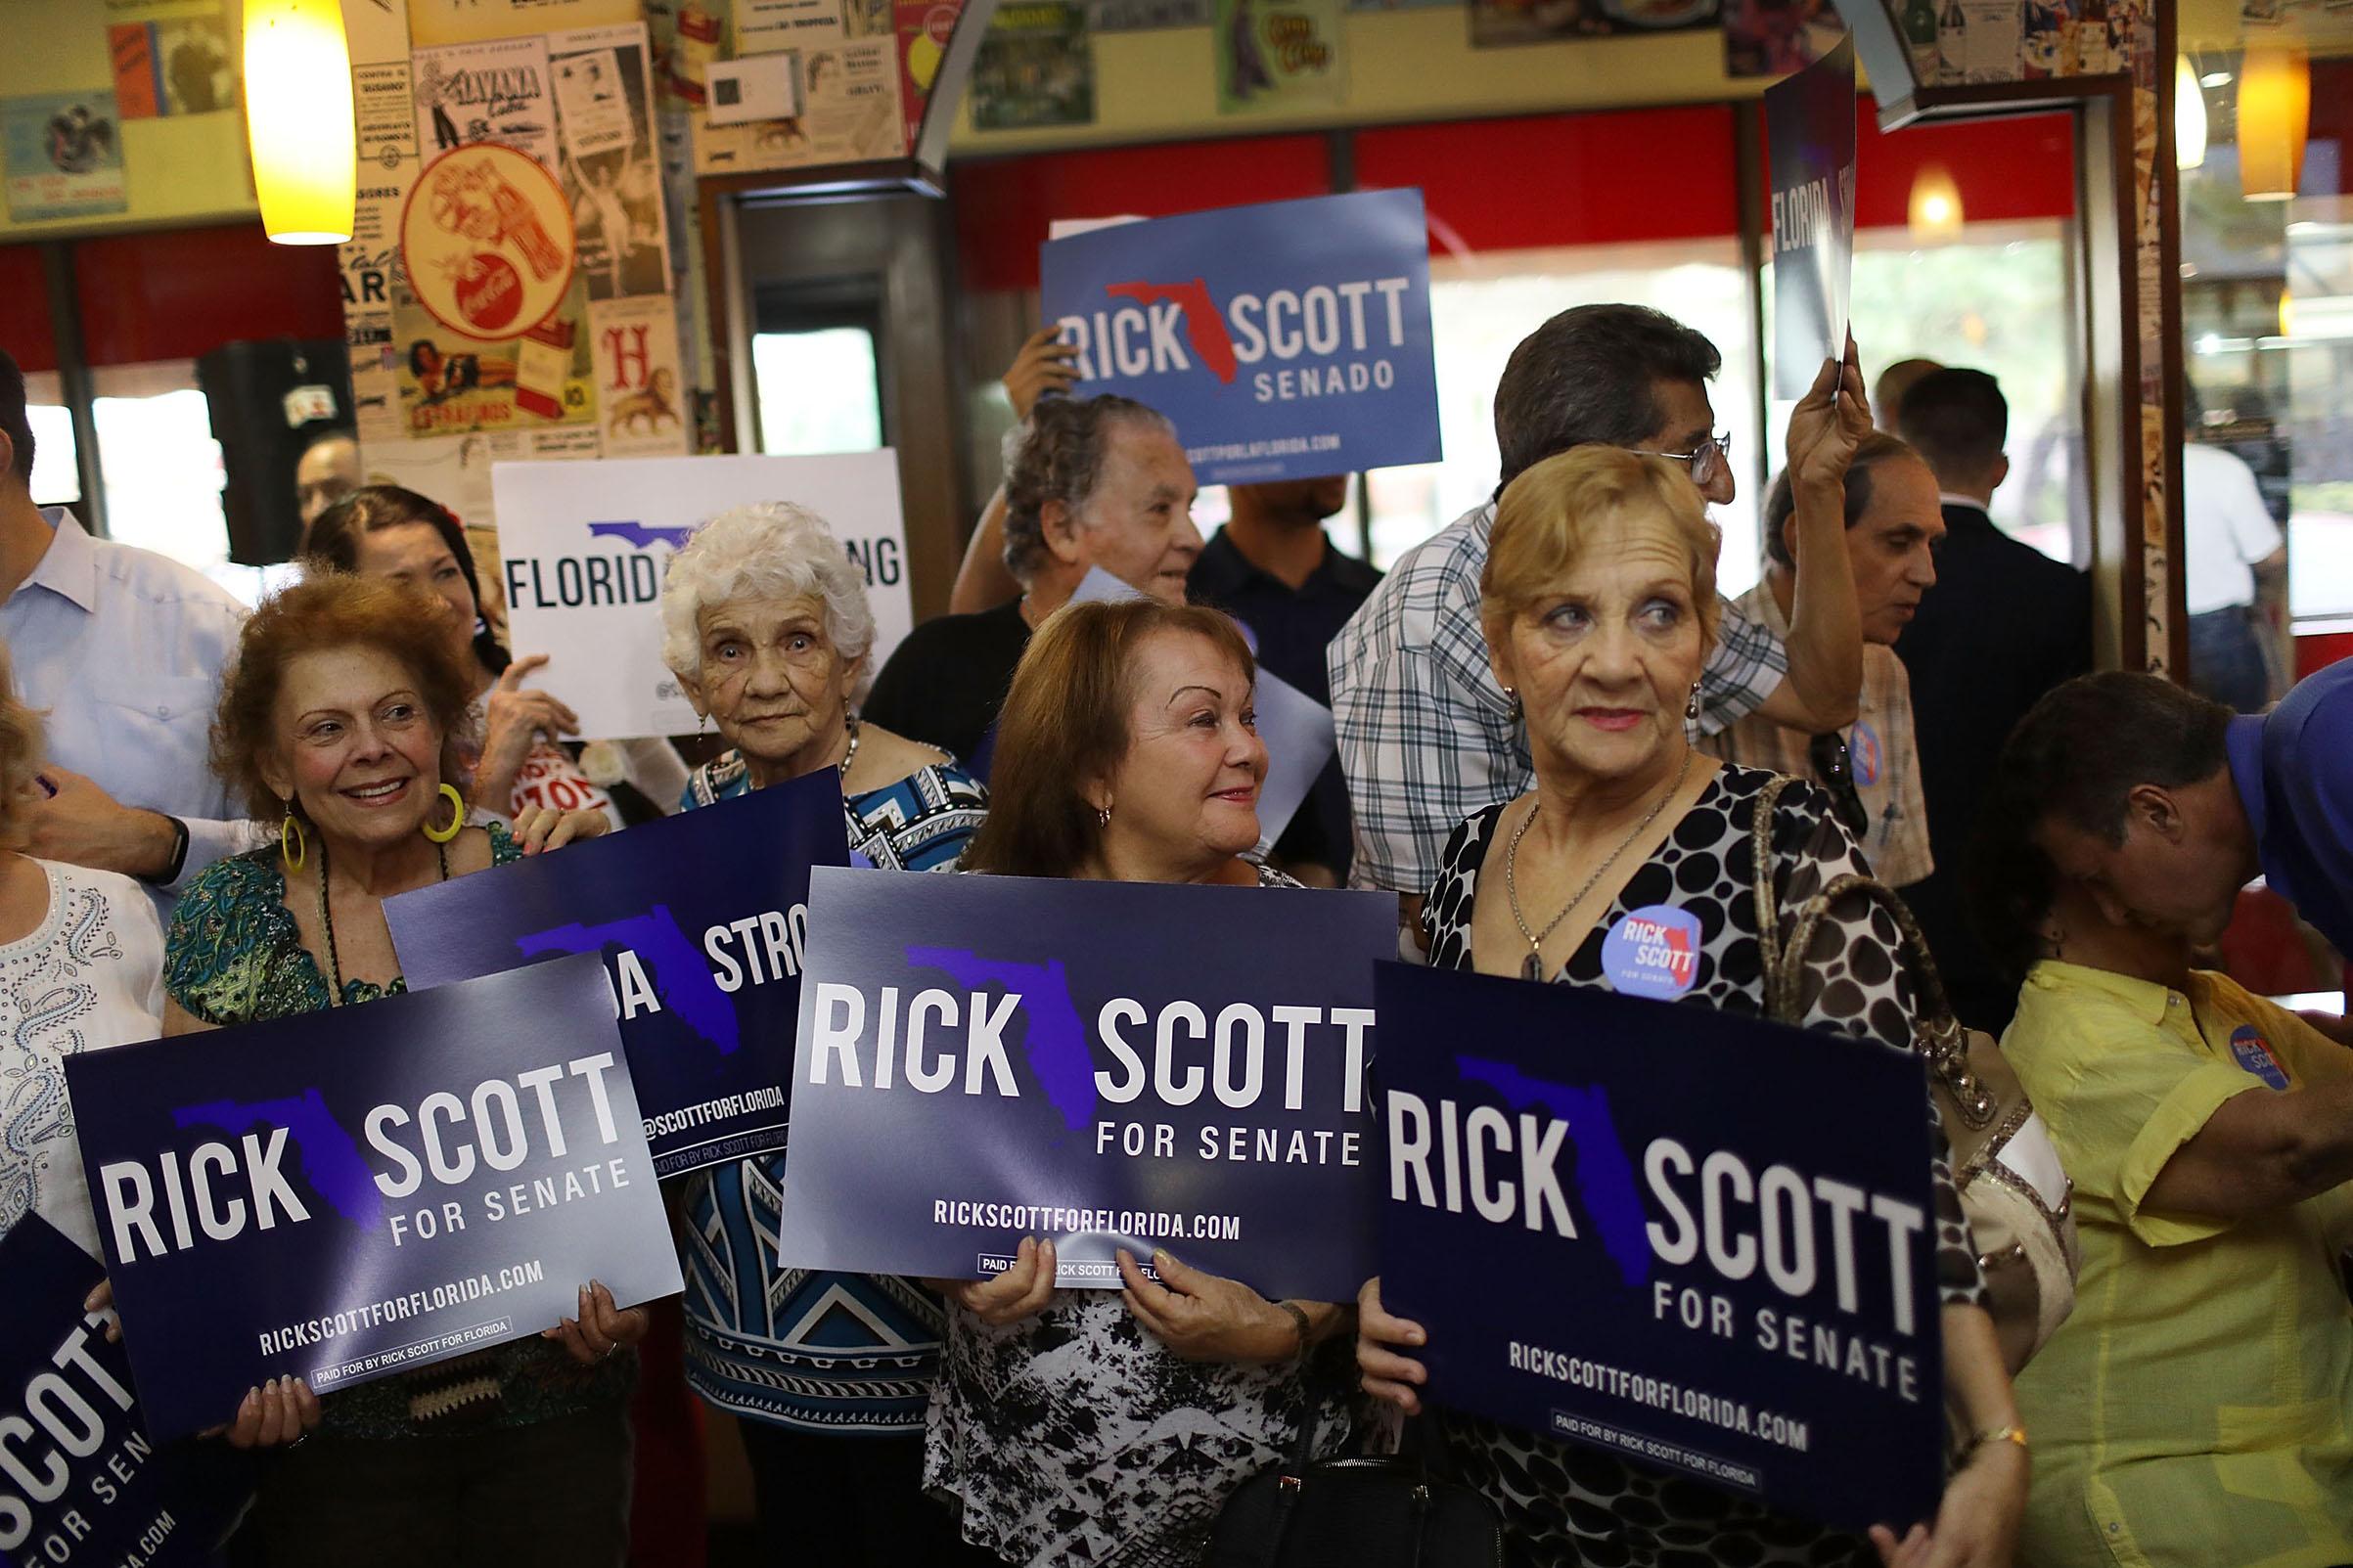 In two of five recent polls, Scott has led his Democratic opponent, Senator Bill Nelson, among Hispanic voters